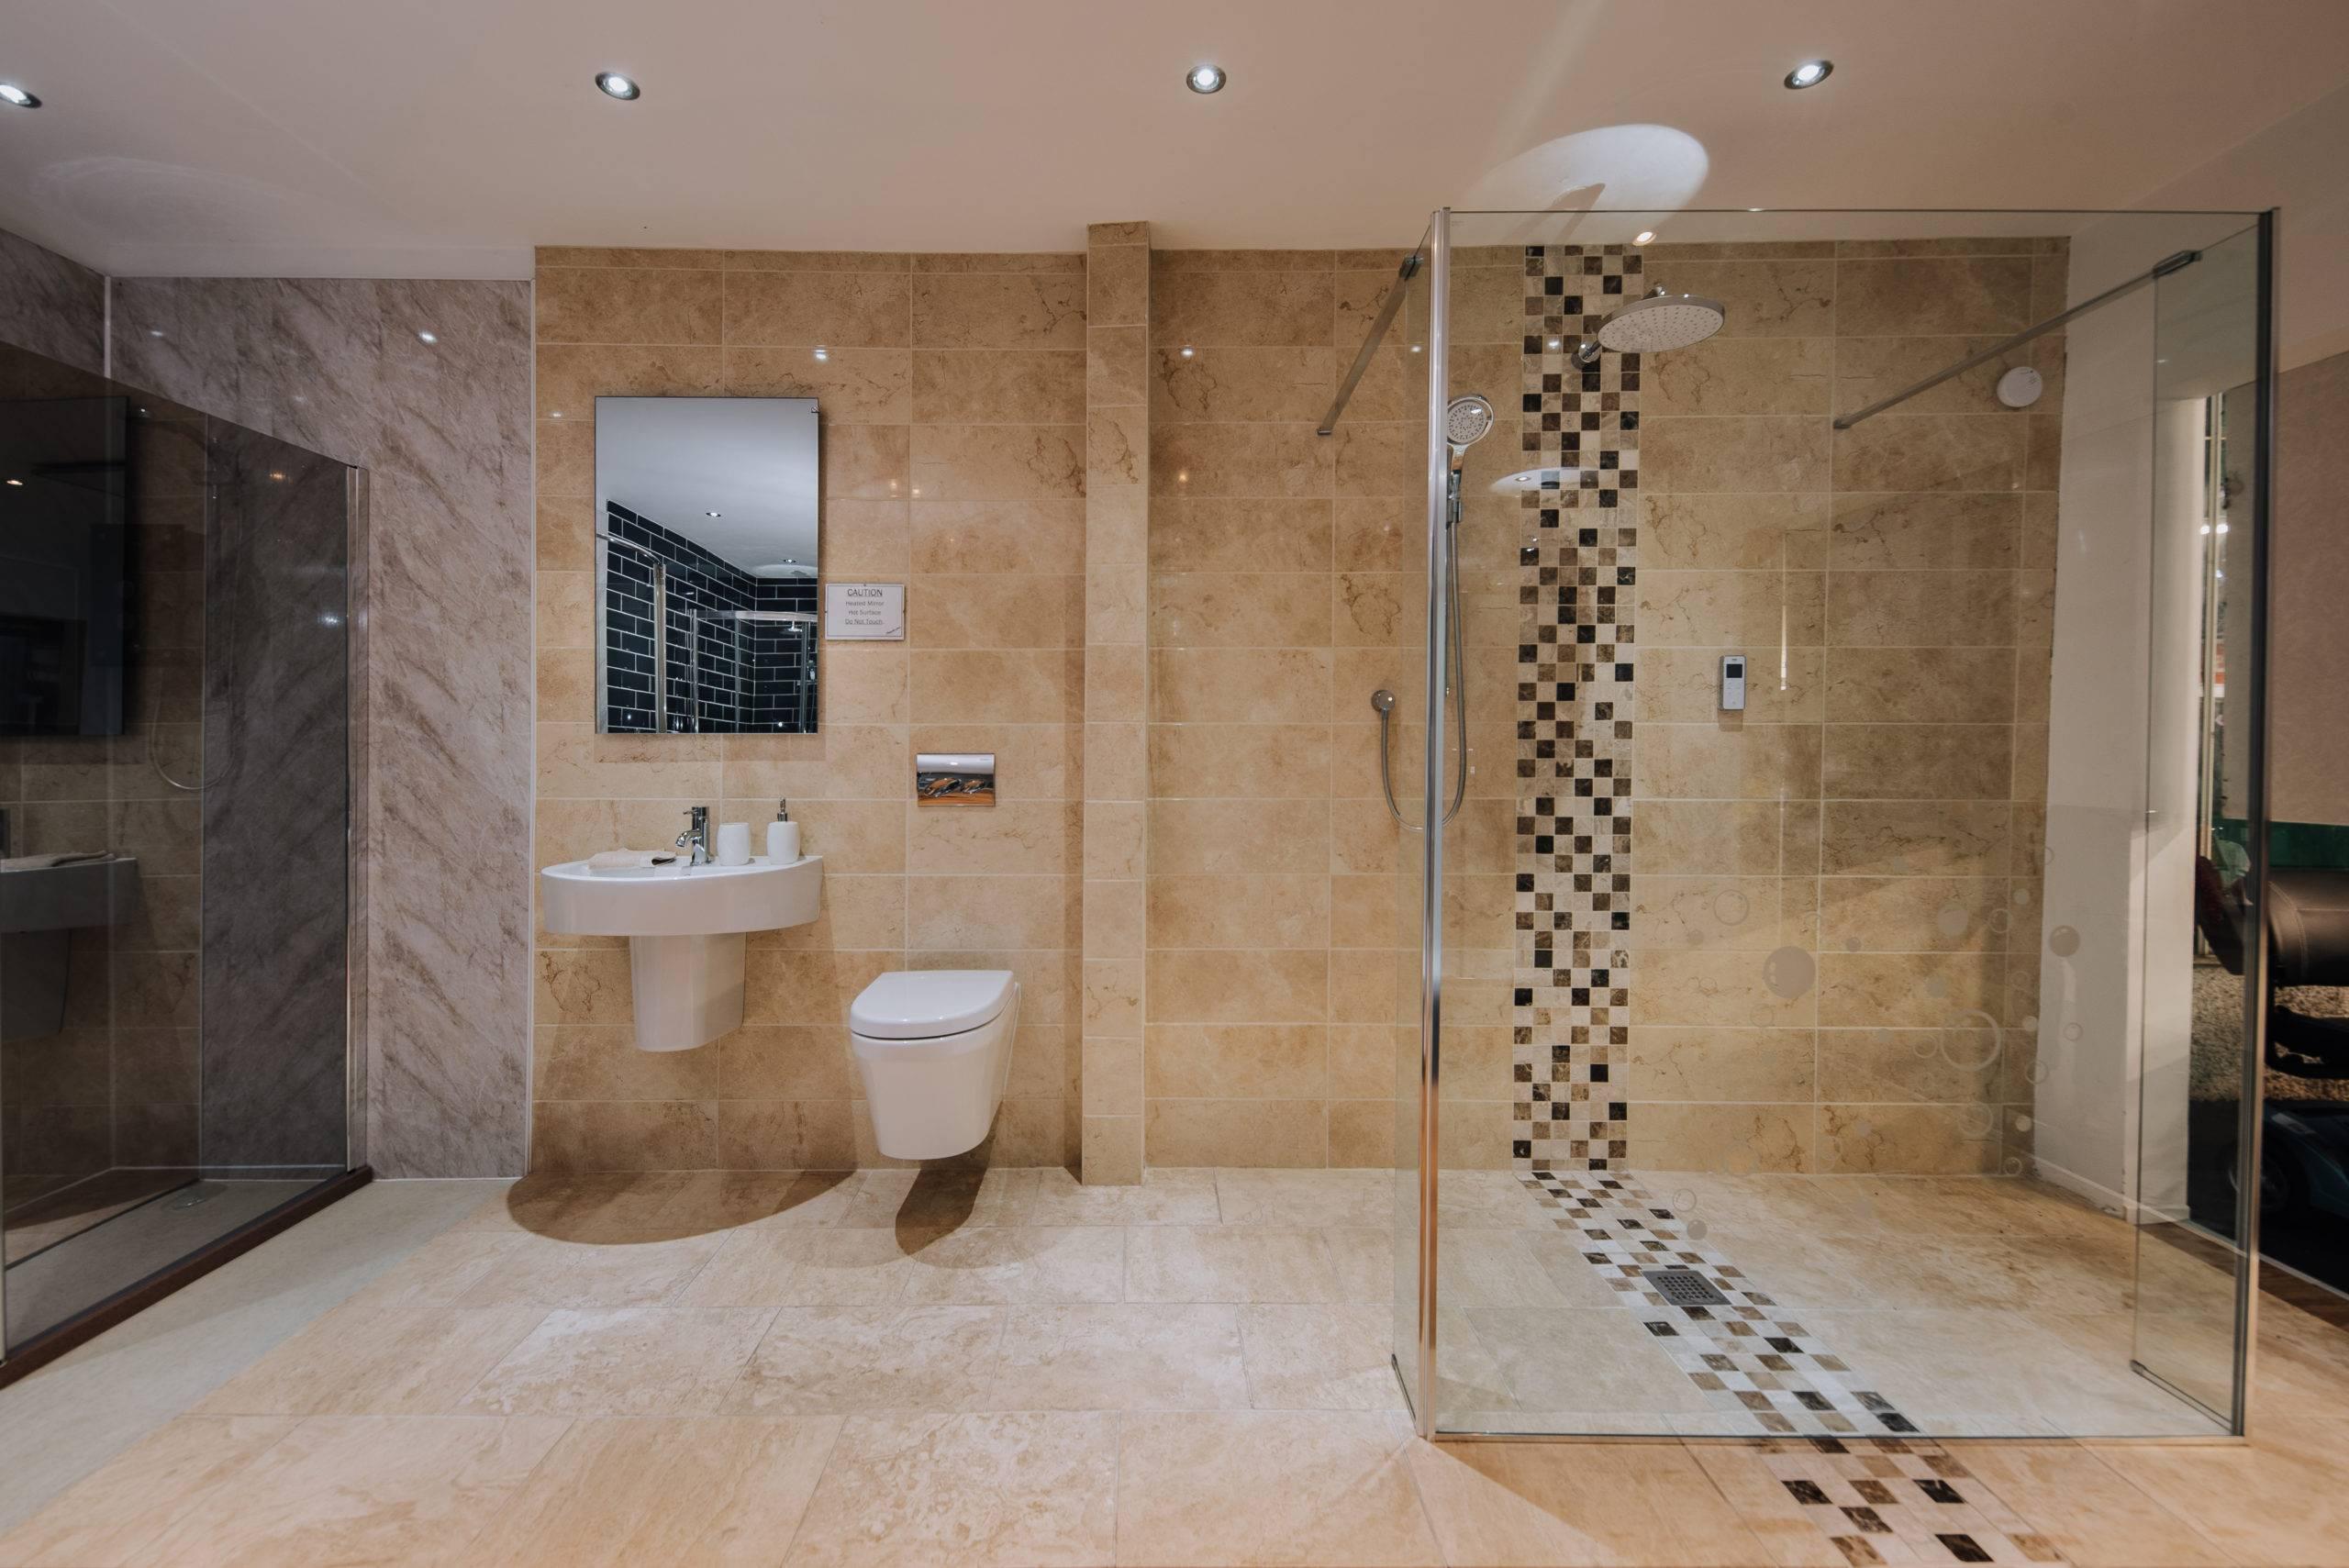 modern tiling-double shower head-glass barrier-